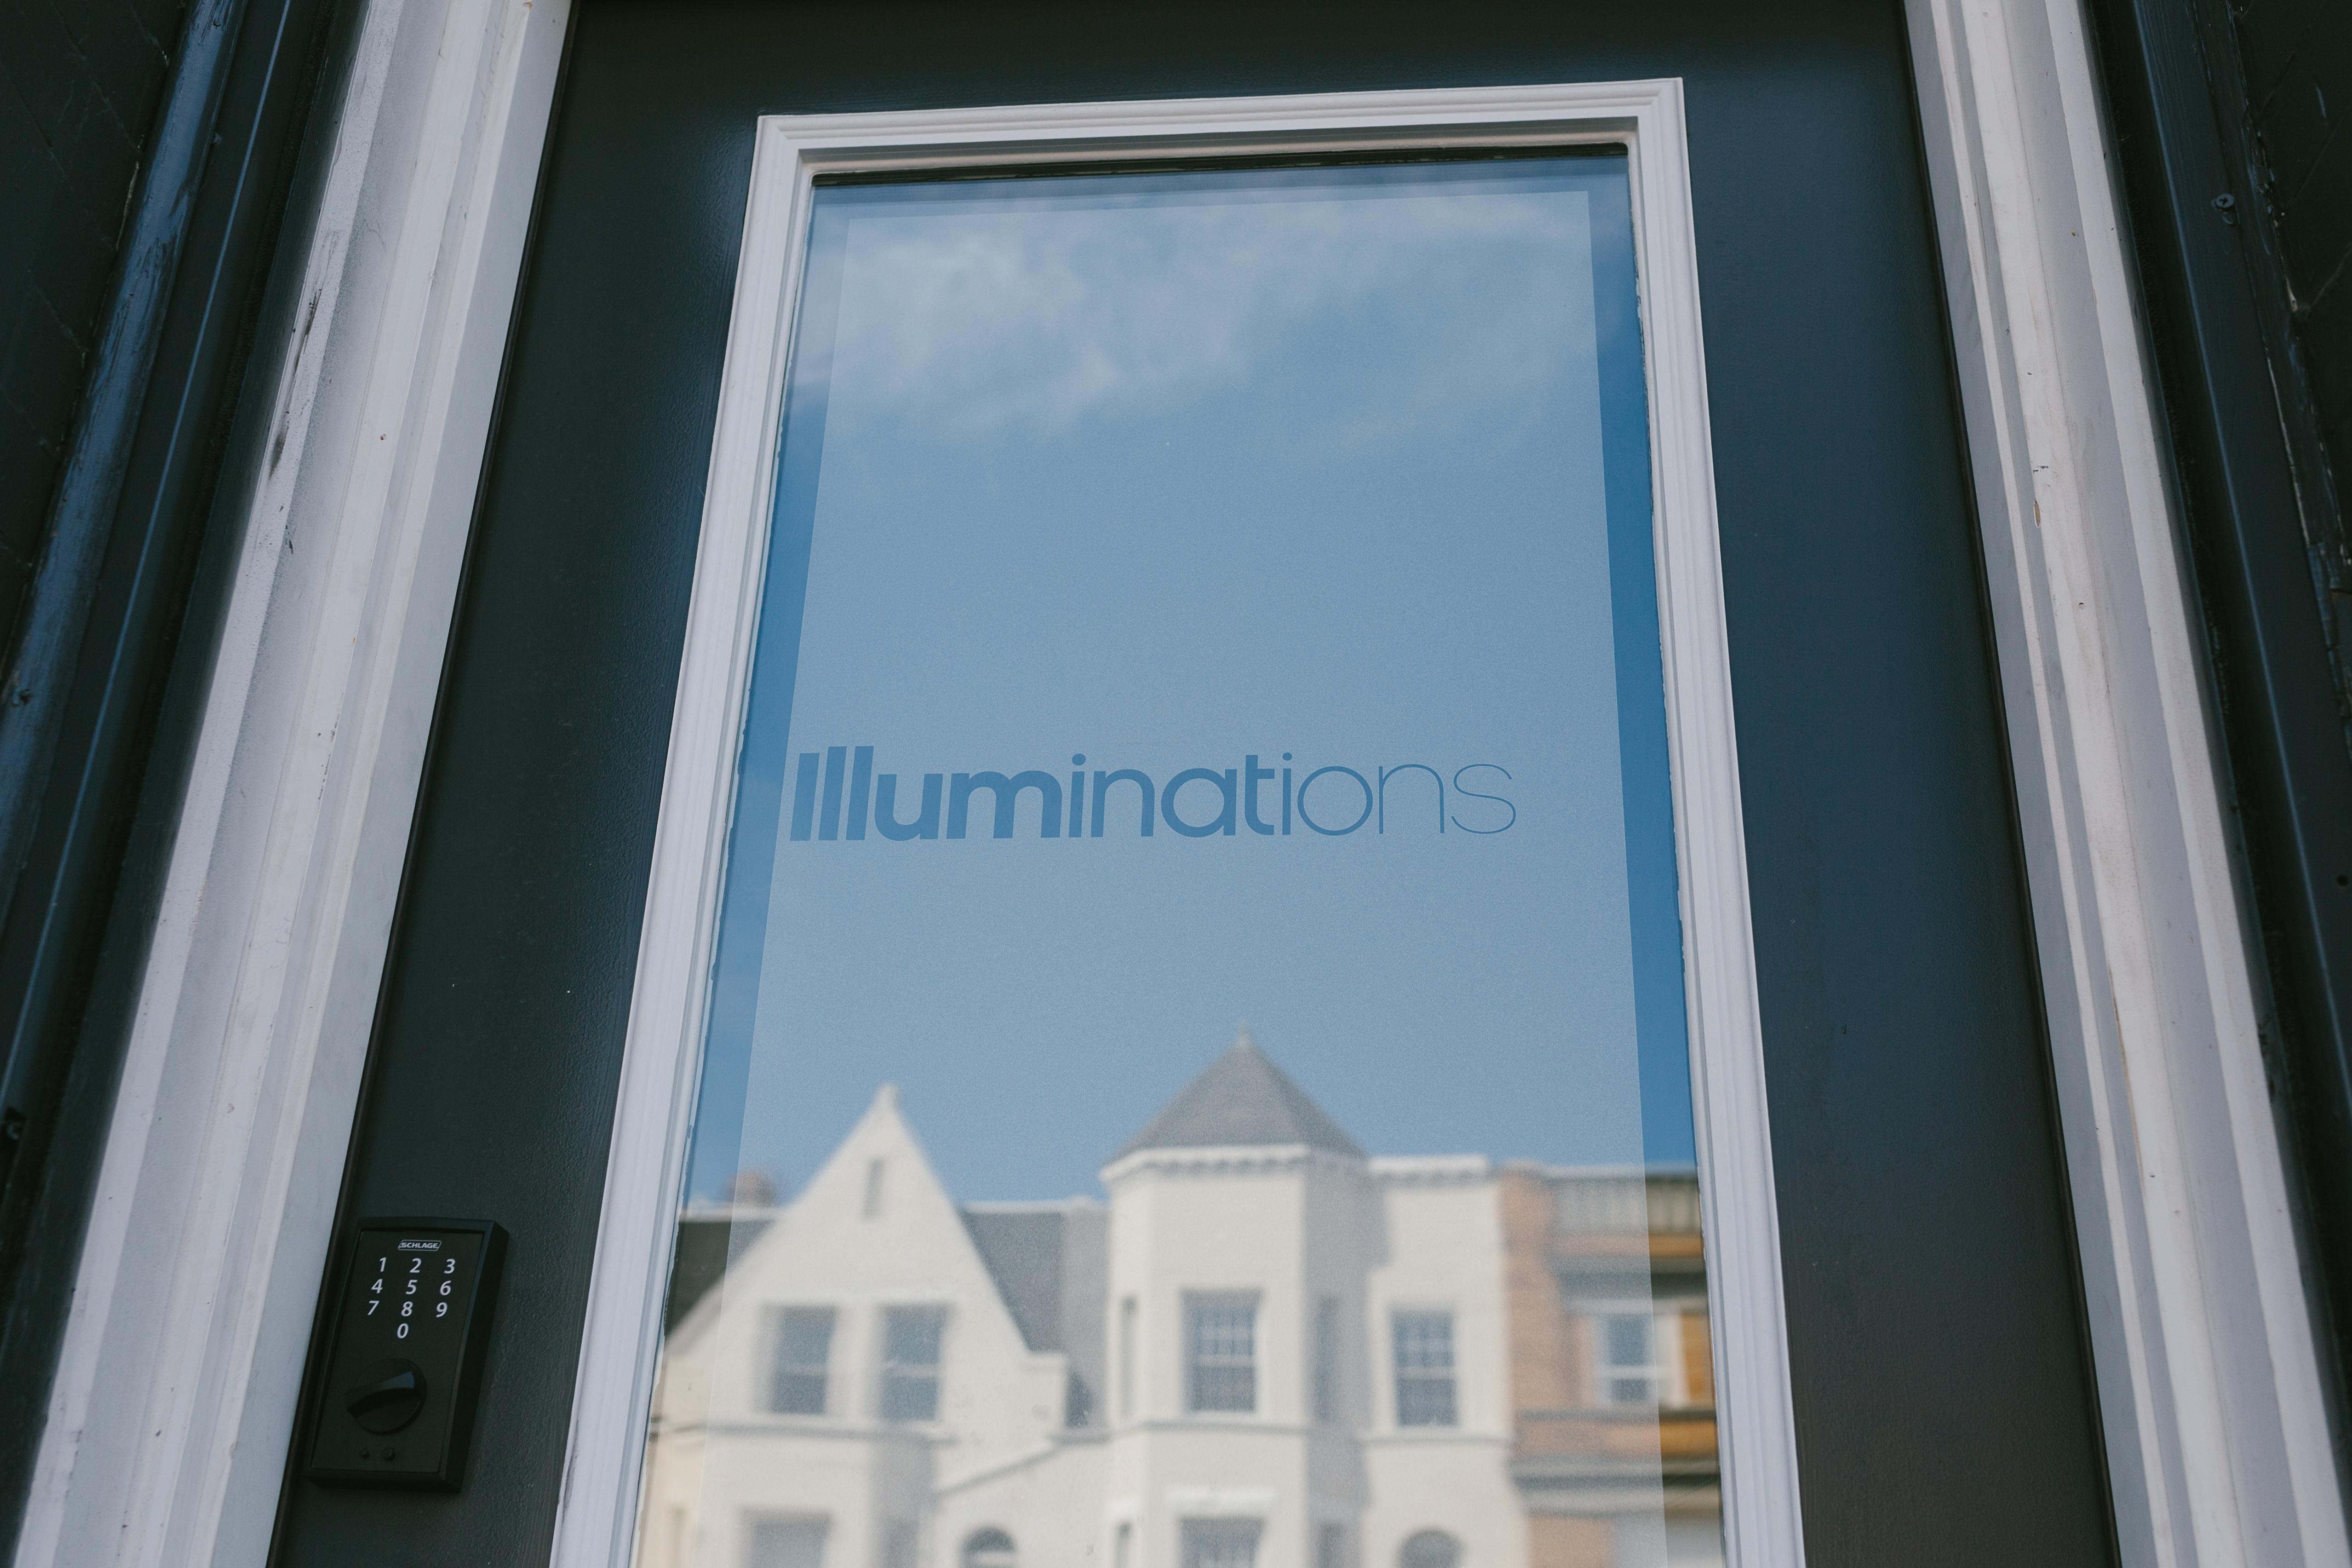 Illuminations front door